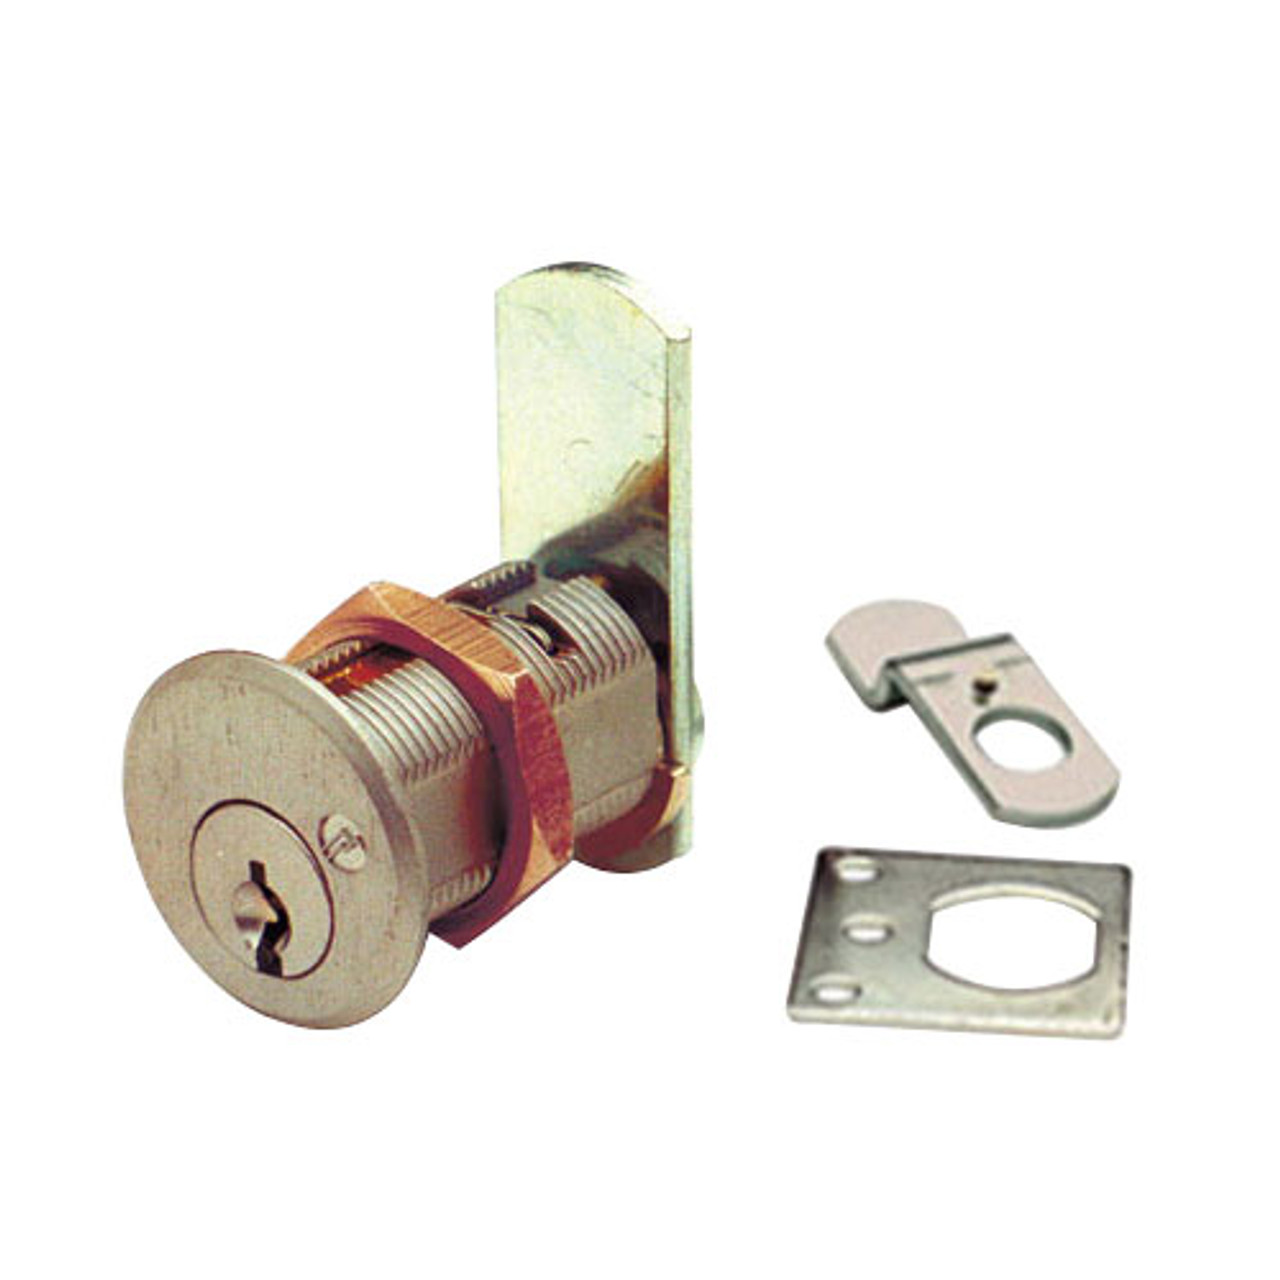 Olympus DCN1-MK-US3 Cam Locks in Bright Brass Finish